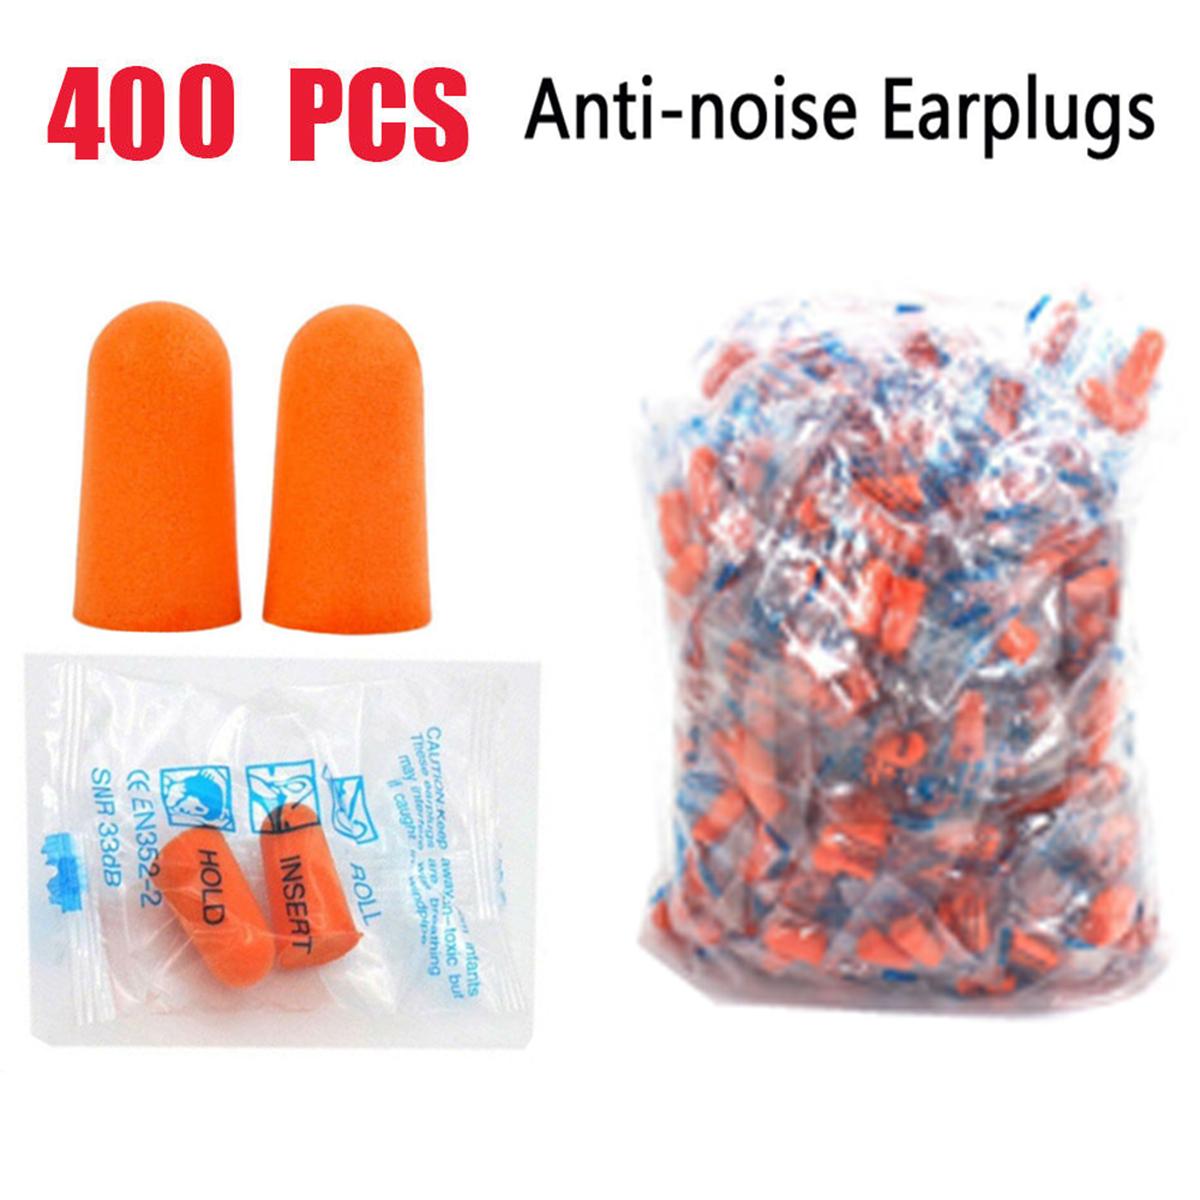 earplugs Ear Plugs Lot Bulk soft Orange foam sleep travel noise shooting